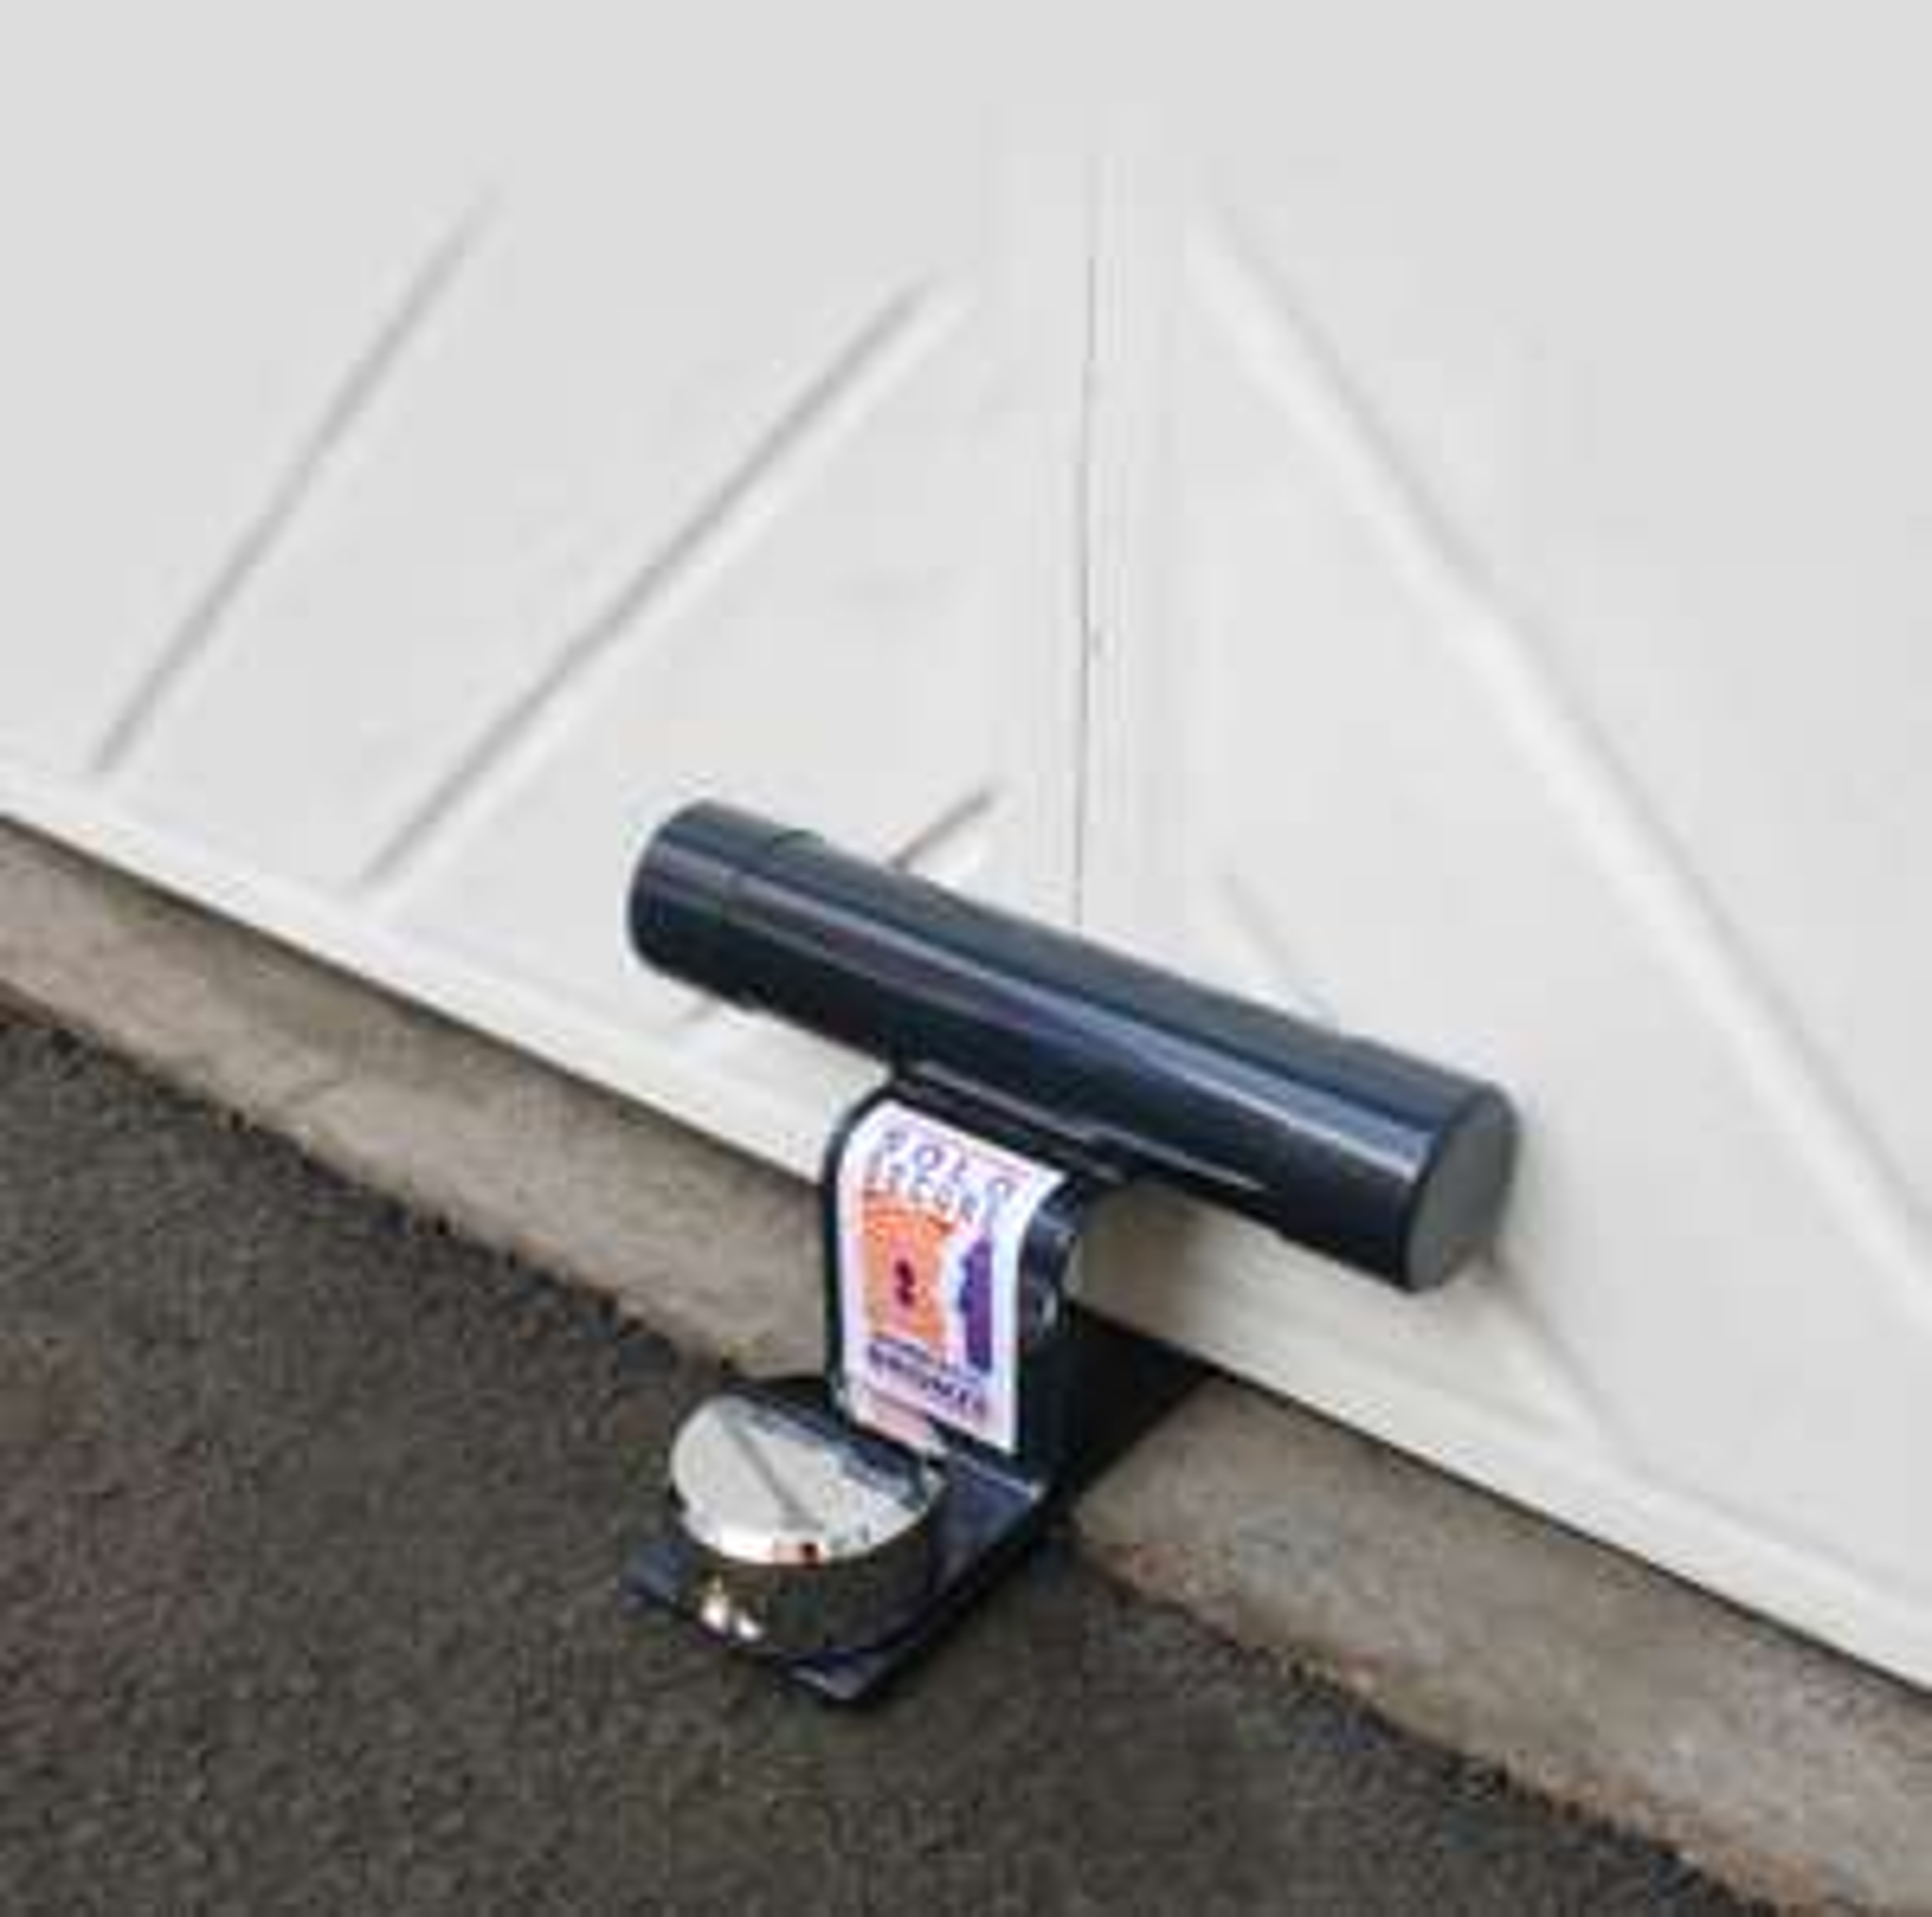 Squire GA4 High Security Garage Door Defender for £10 @ Halfords (Free Collection)